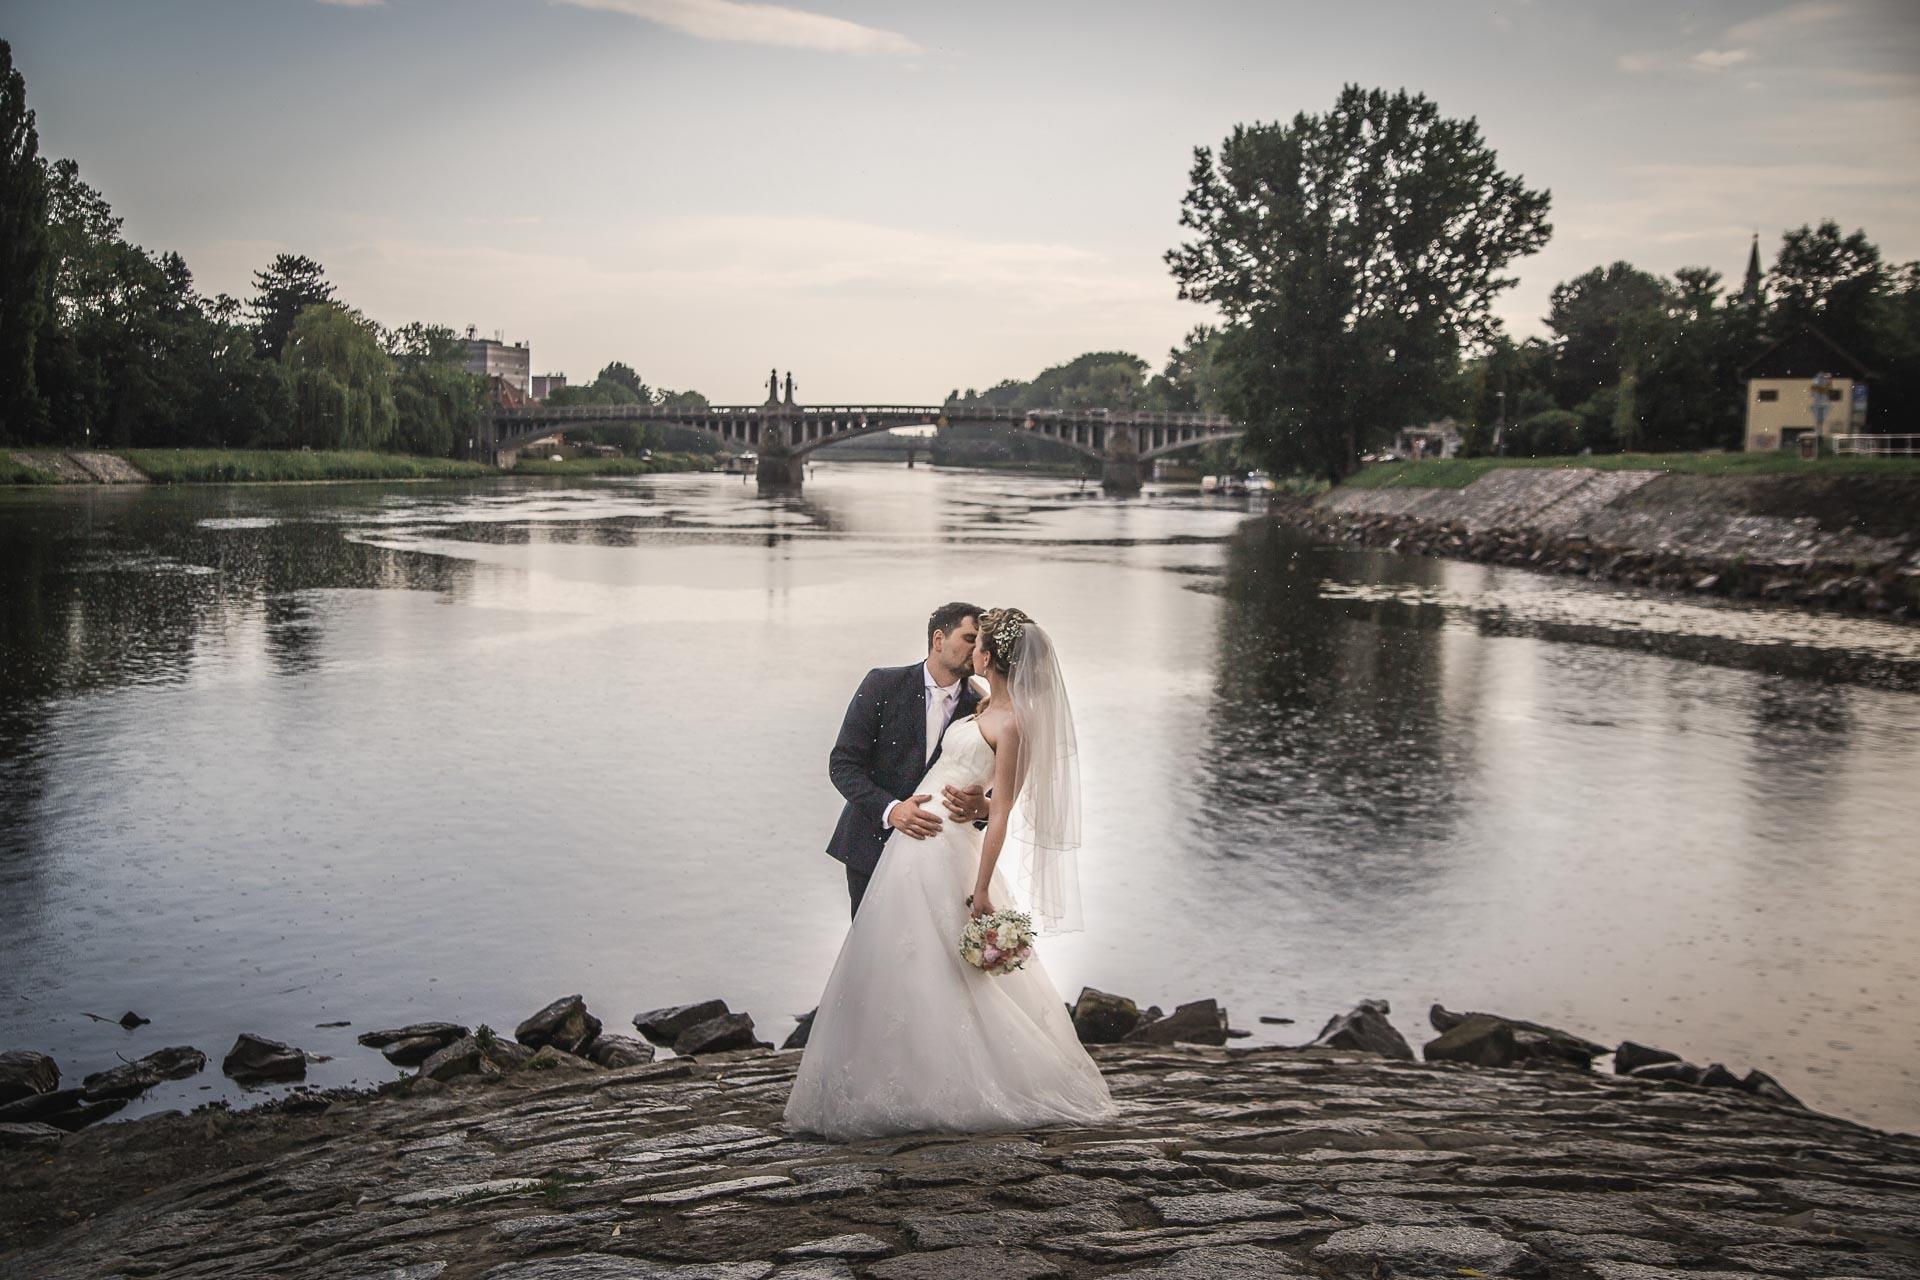 Svatební-fotograf-Nymburk-6236